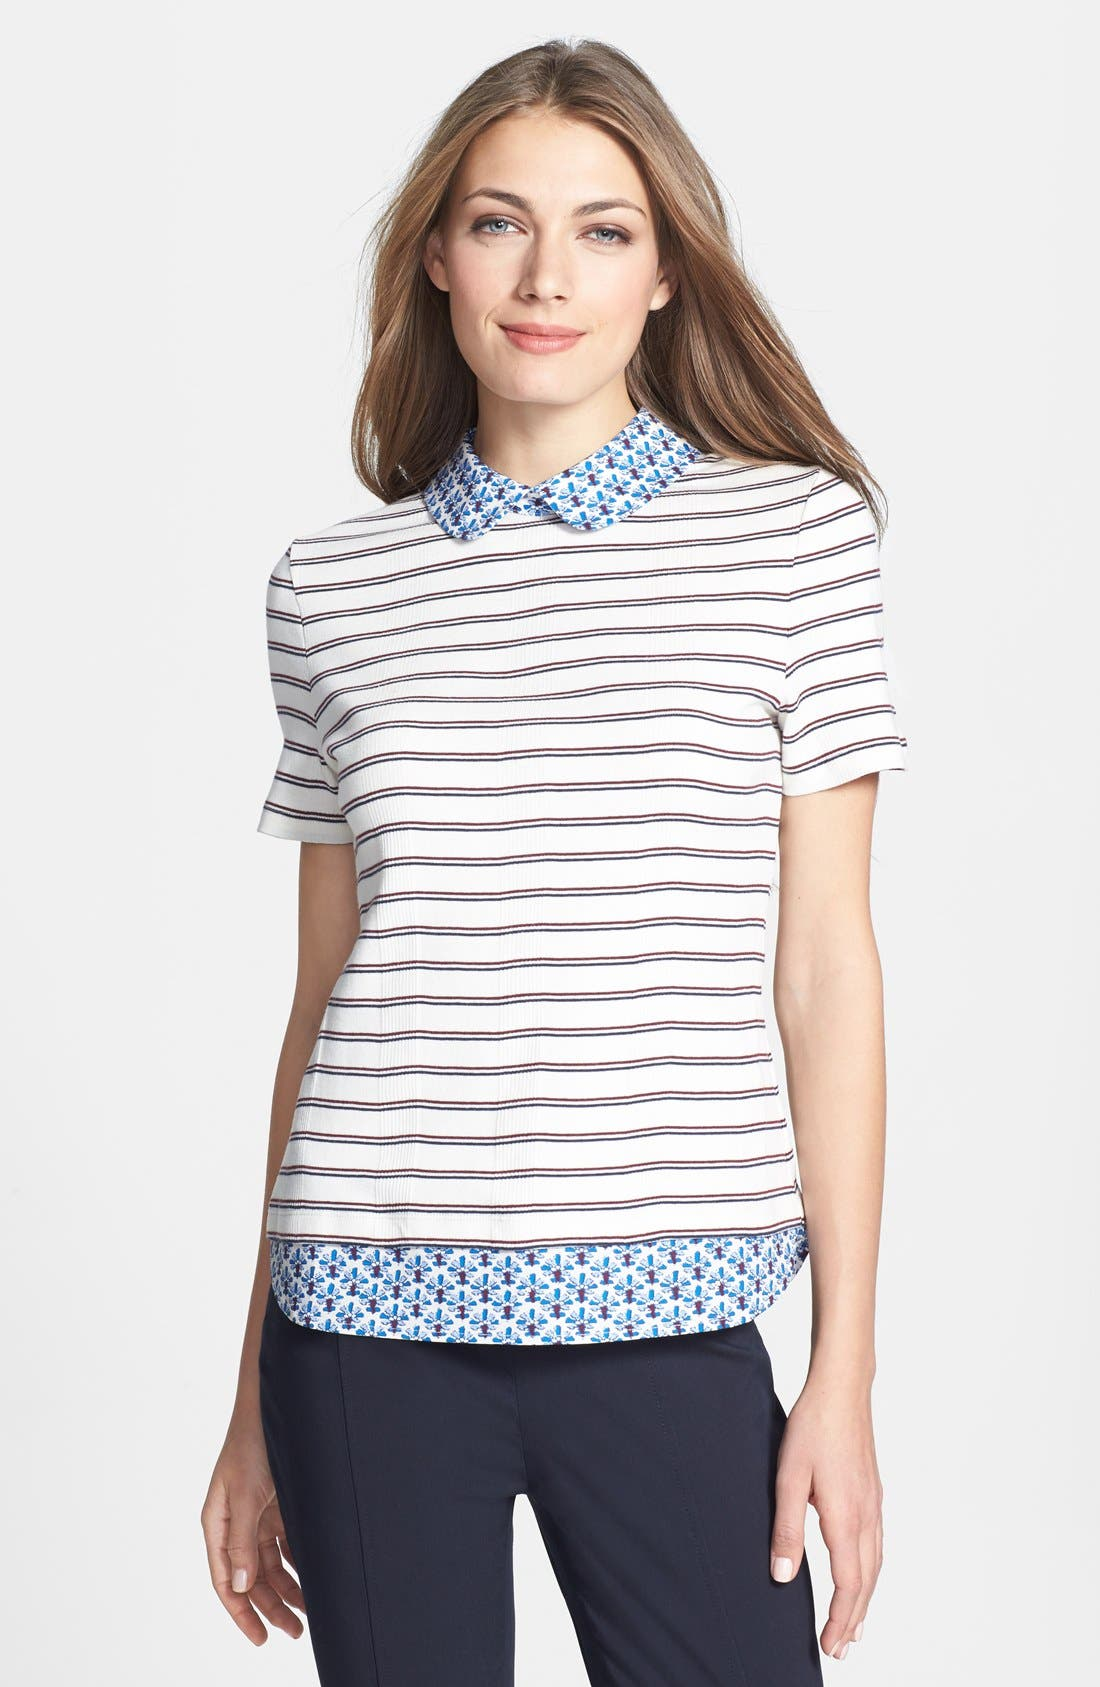 Main Image - Tory Burch 'Alexandria' Cotton Top